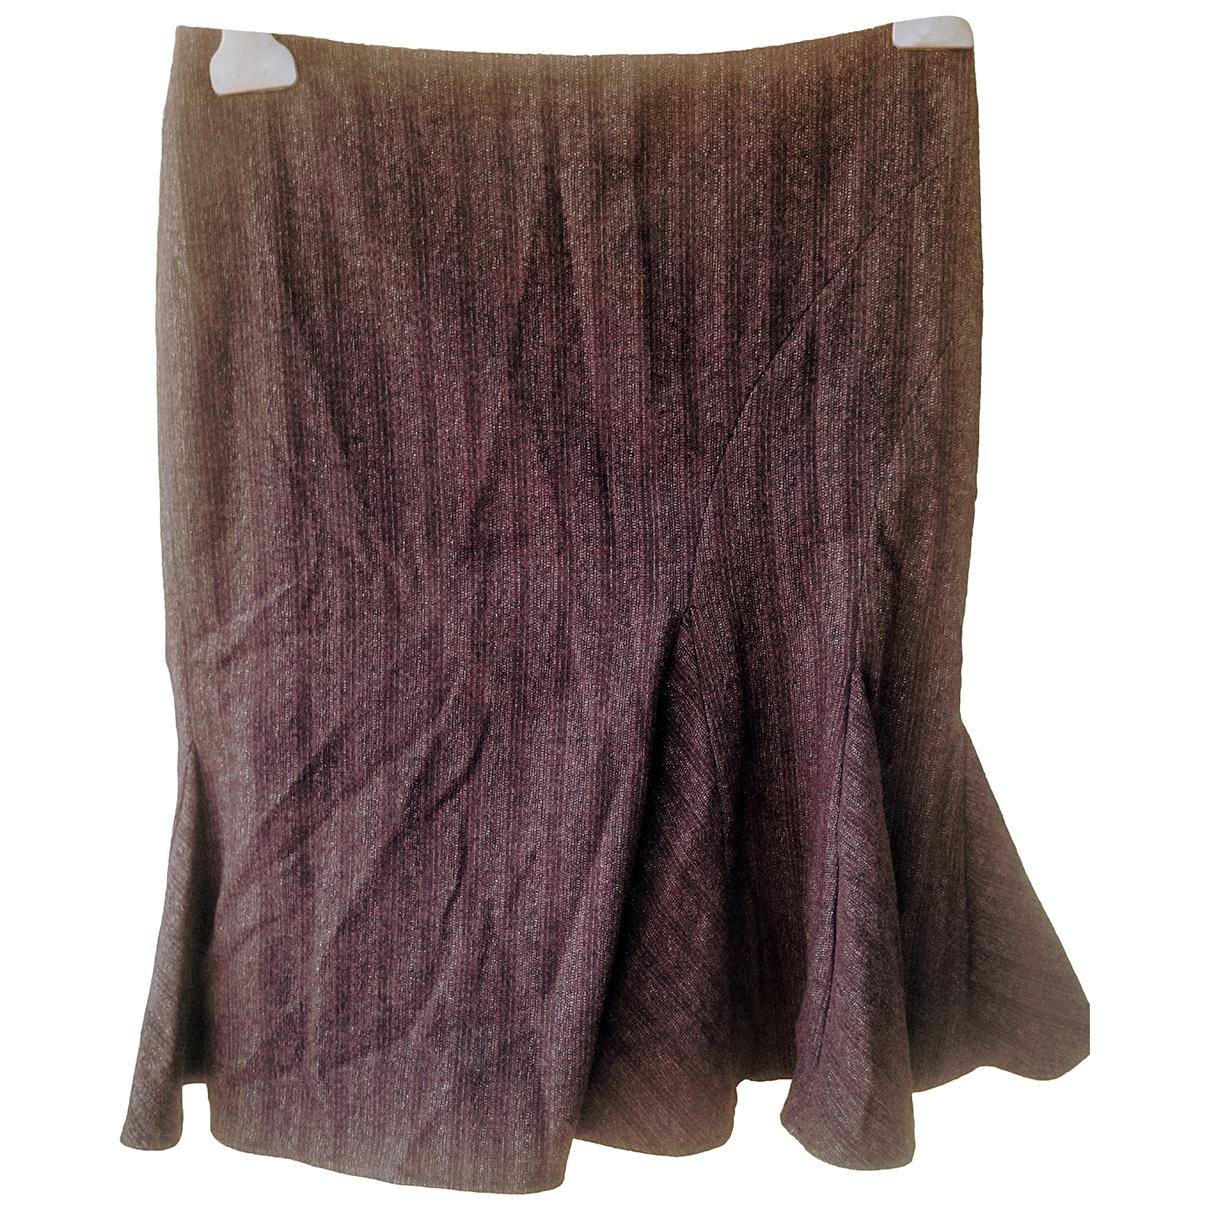 Max & Co \N Wool skirt for Women 42 IT